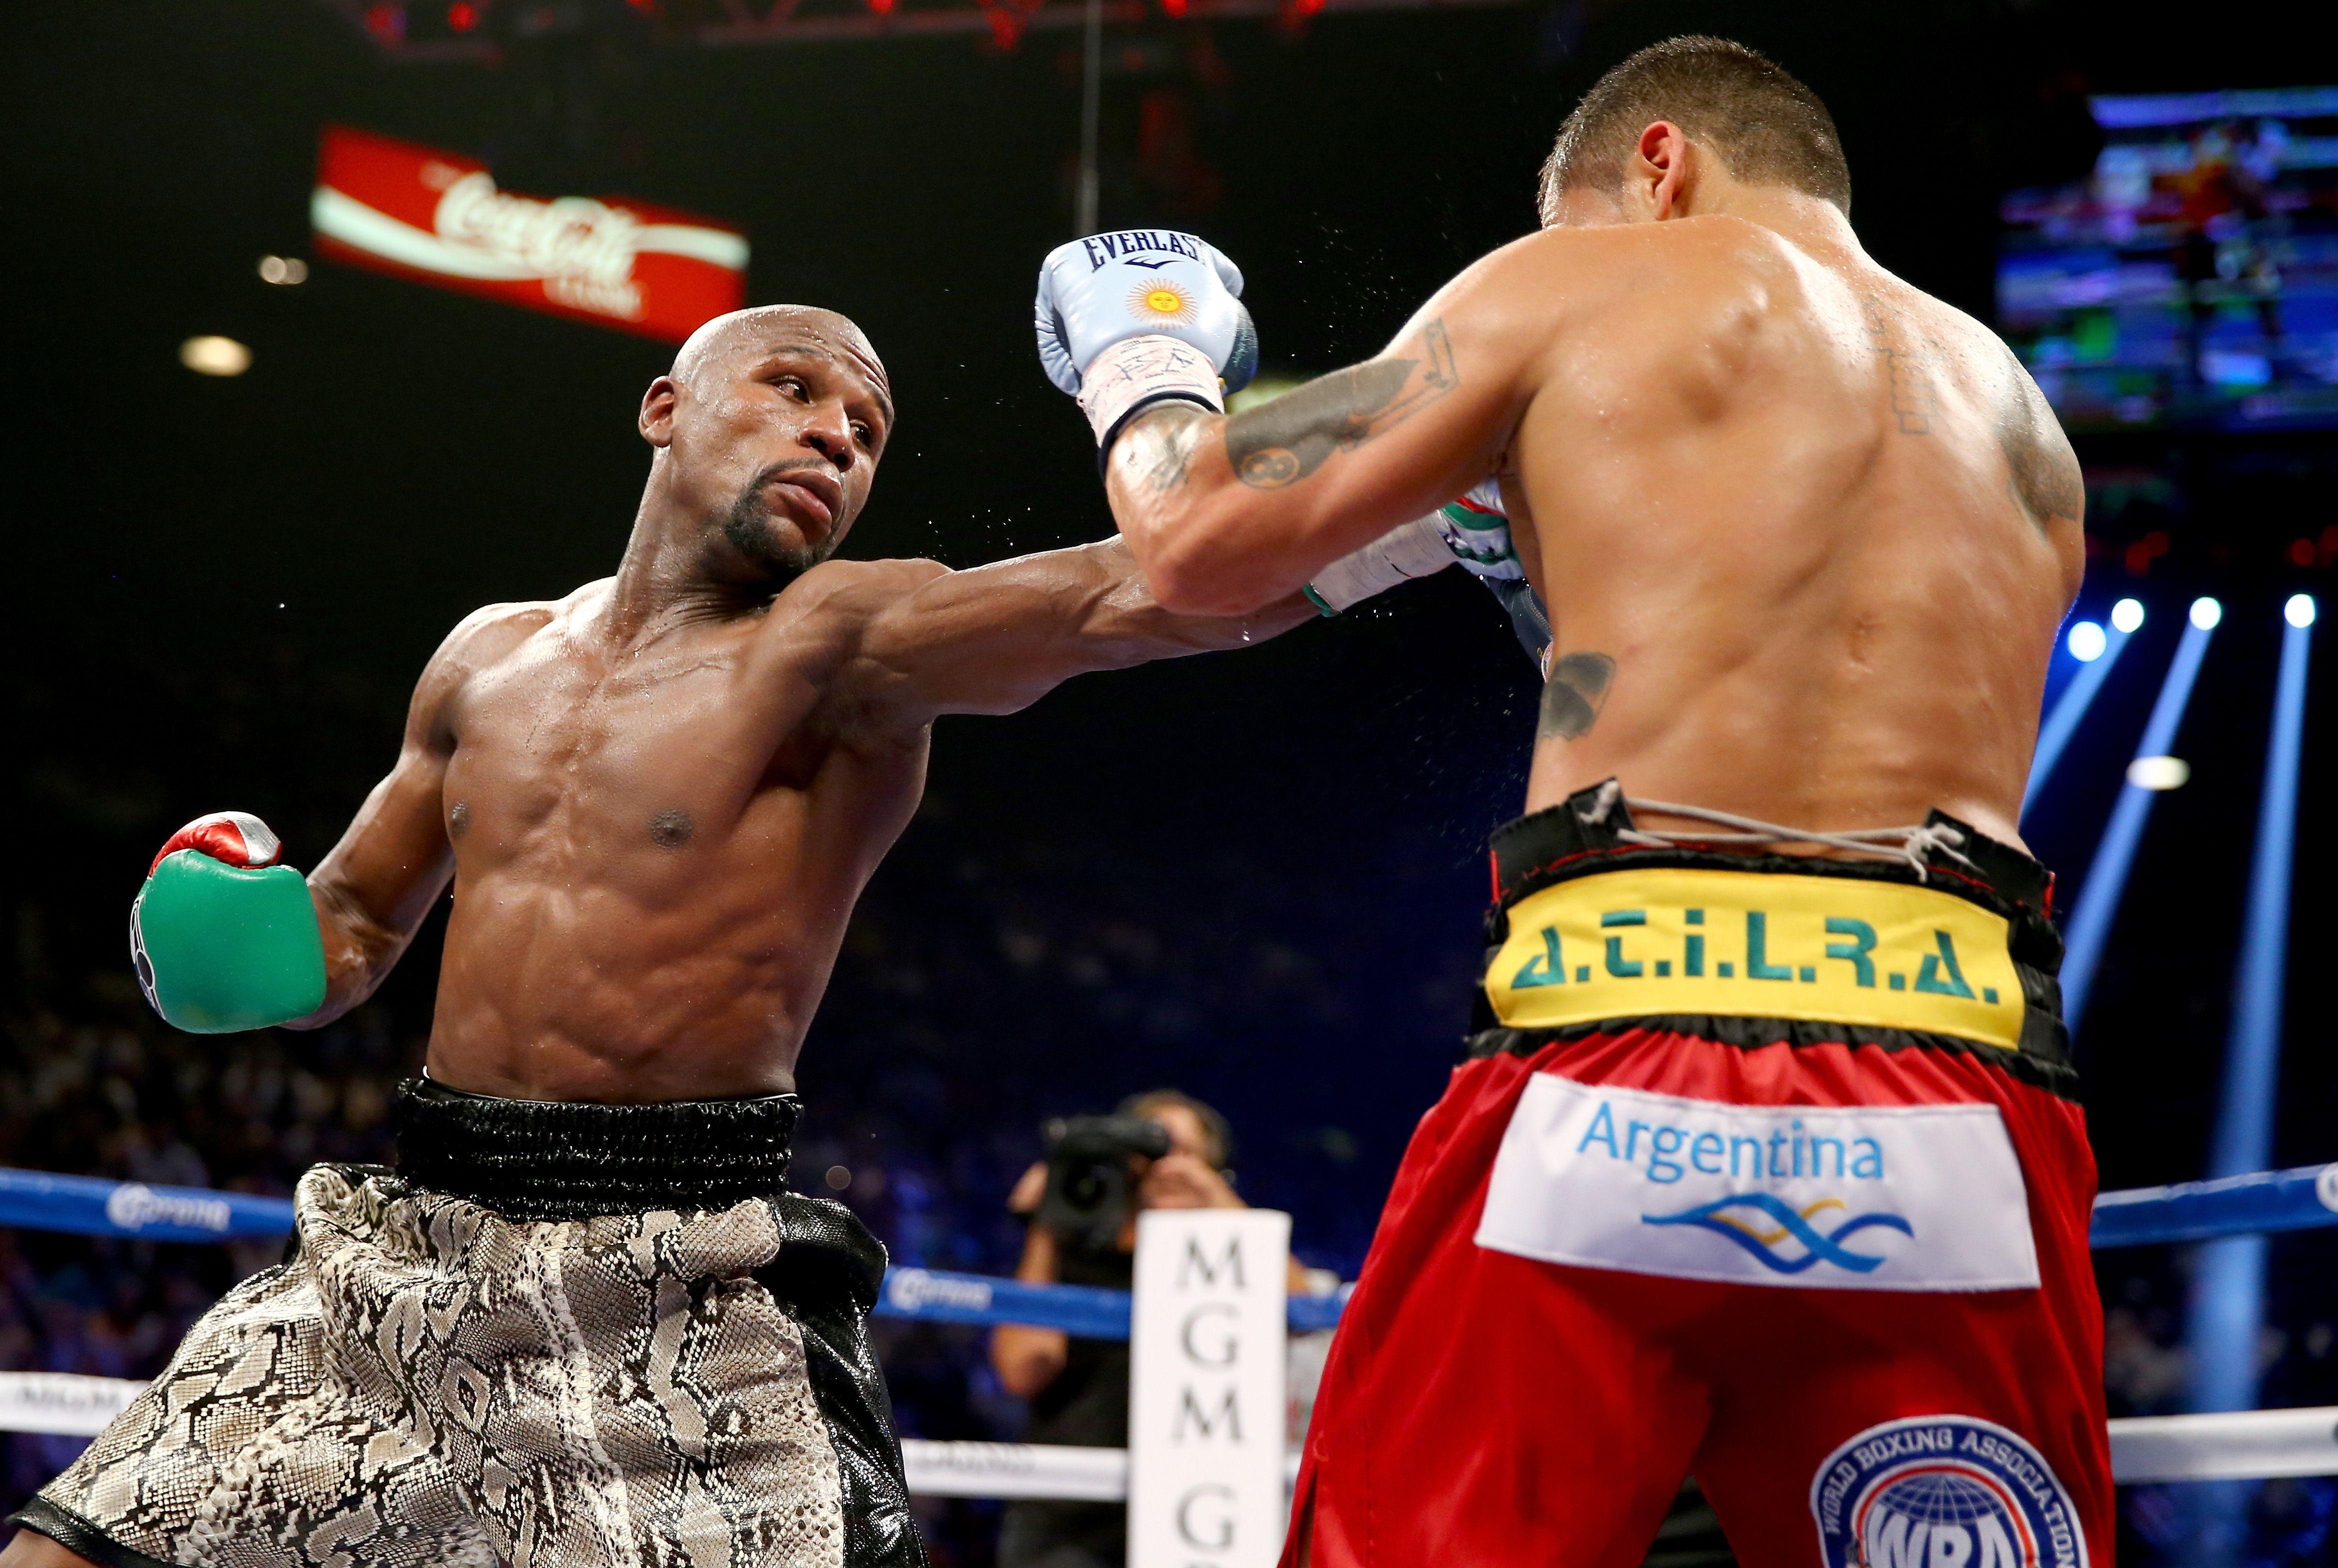 Floyd Mayweather Jr Boxing Images Boxing Images Sport Boxing Floyd Mayweather